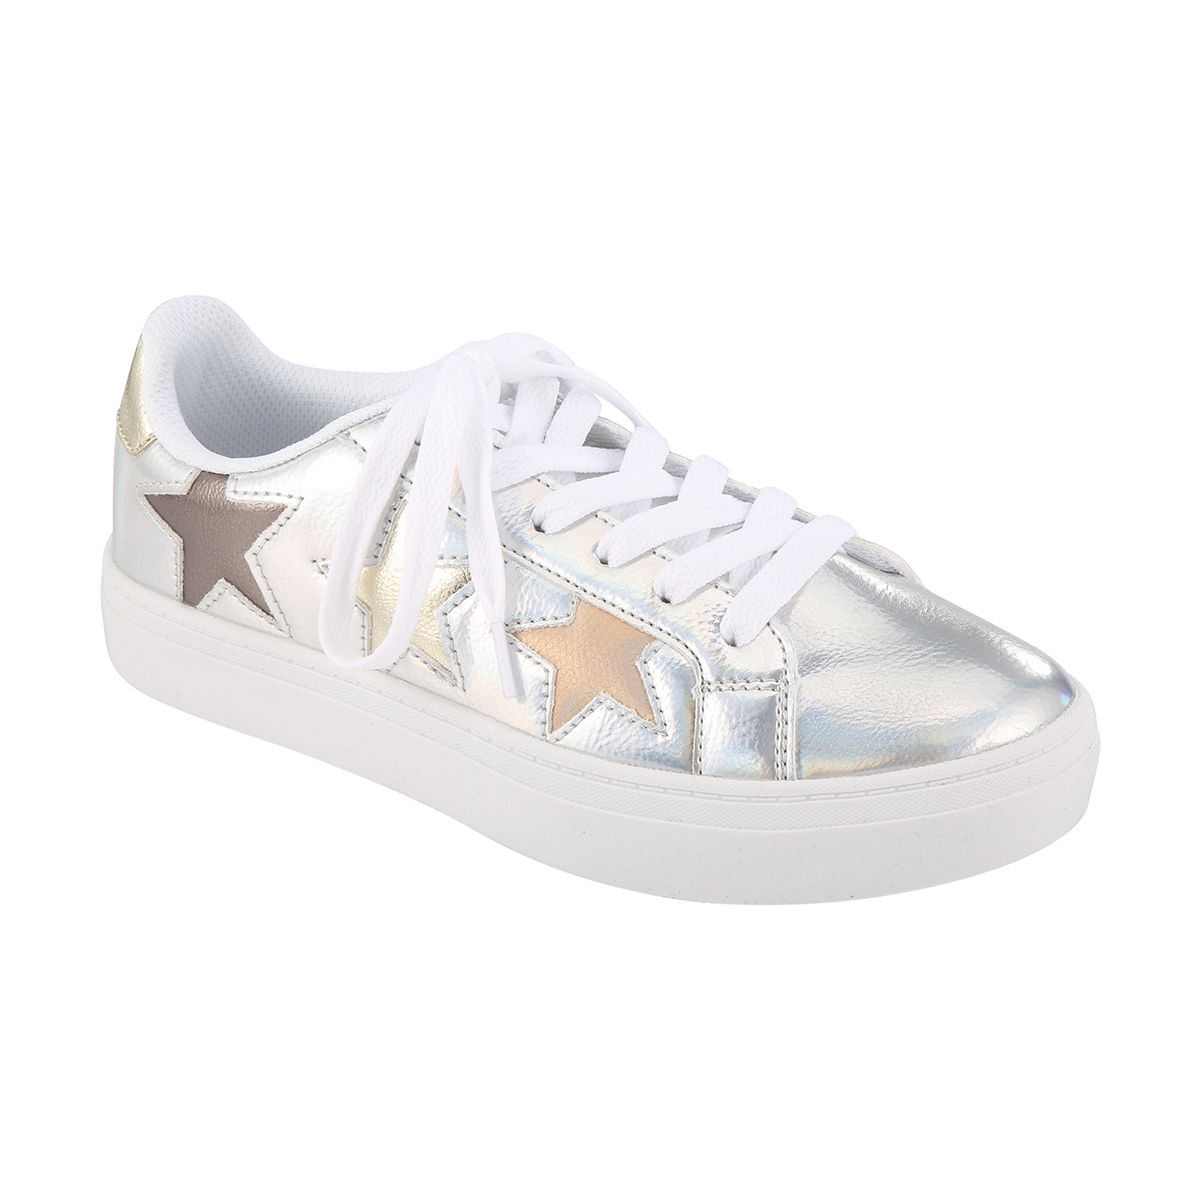 sneakers, Womens shoe store